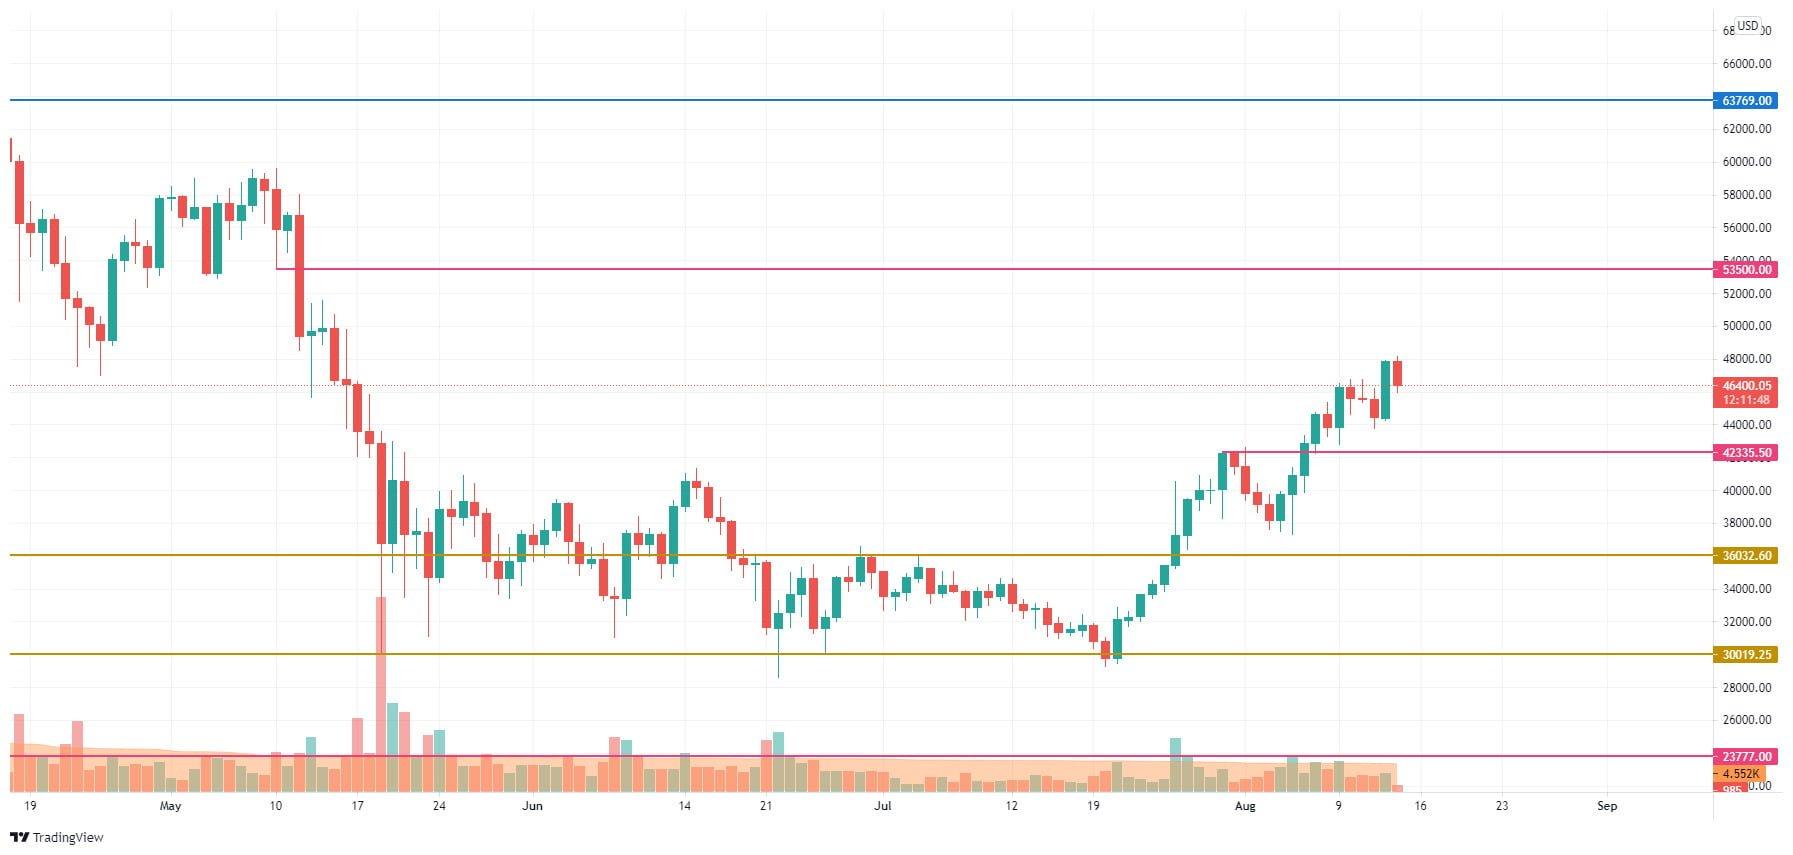 14 Ağustos Bitcoin (BTC) Fiyat Analizi: BTC 50.000 Dolara Ulaşabilir mi? 4 - 14 agustos bitcoin btc fiyat analizi 4